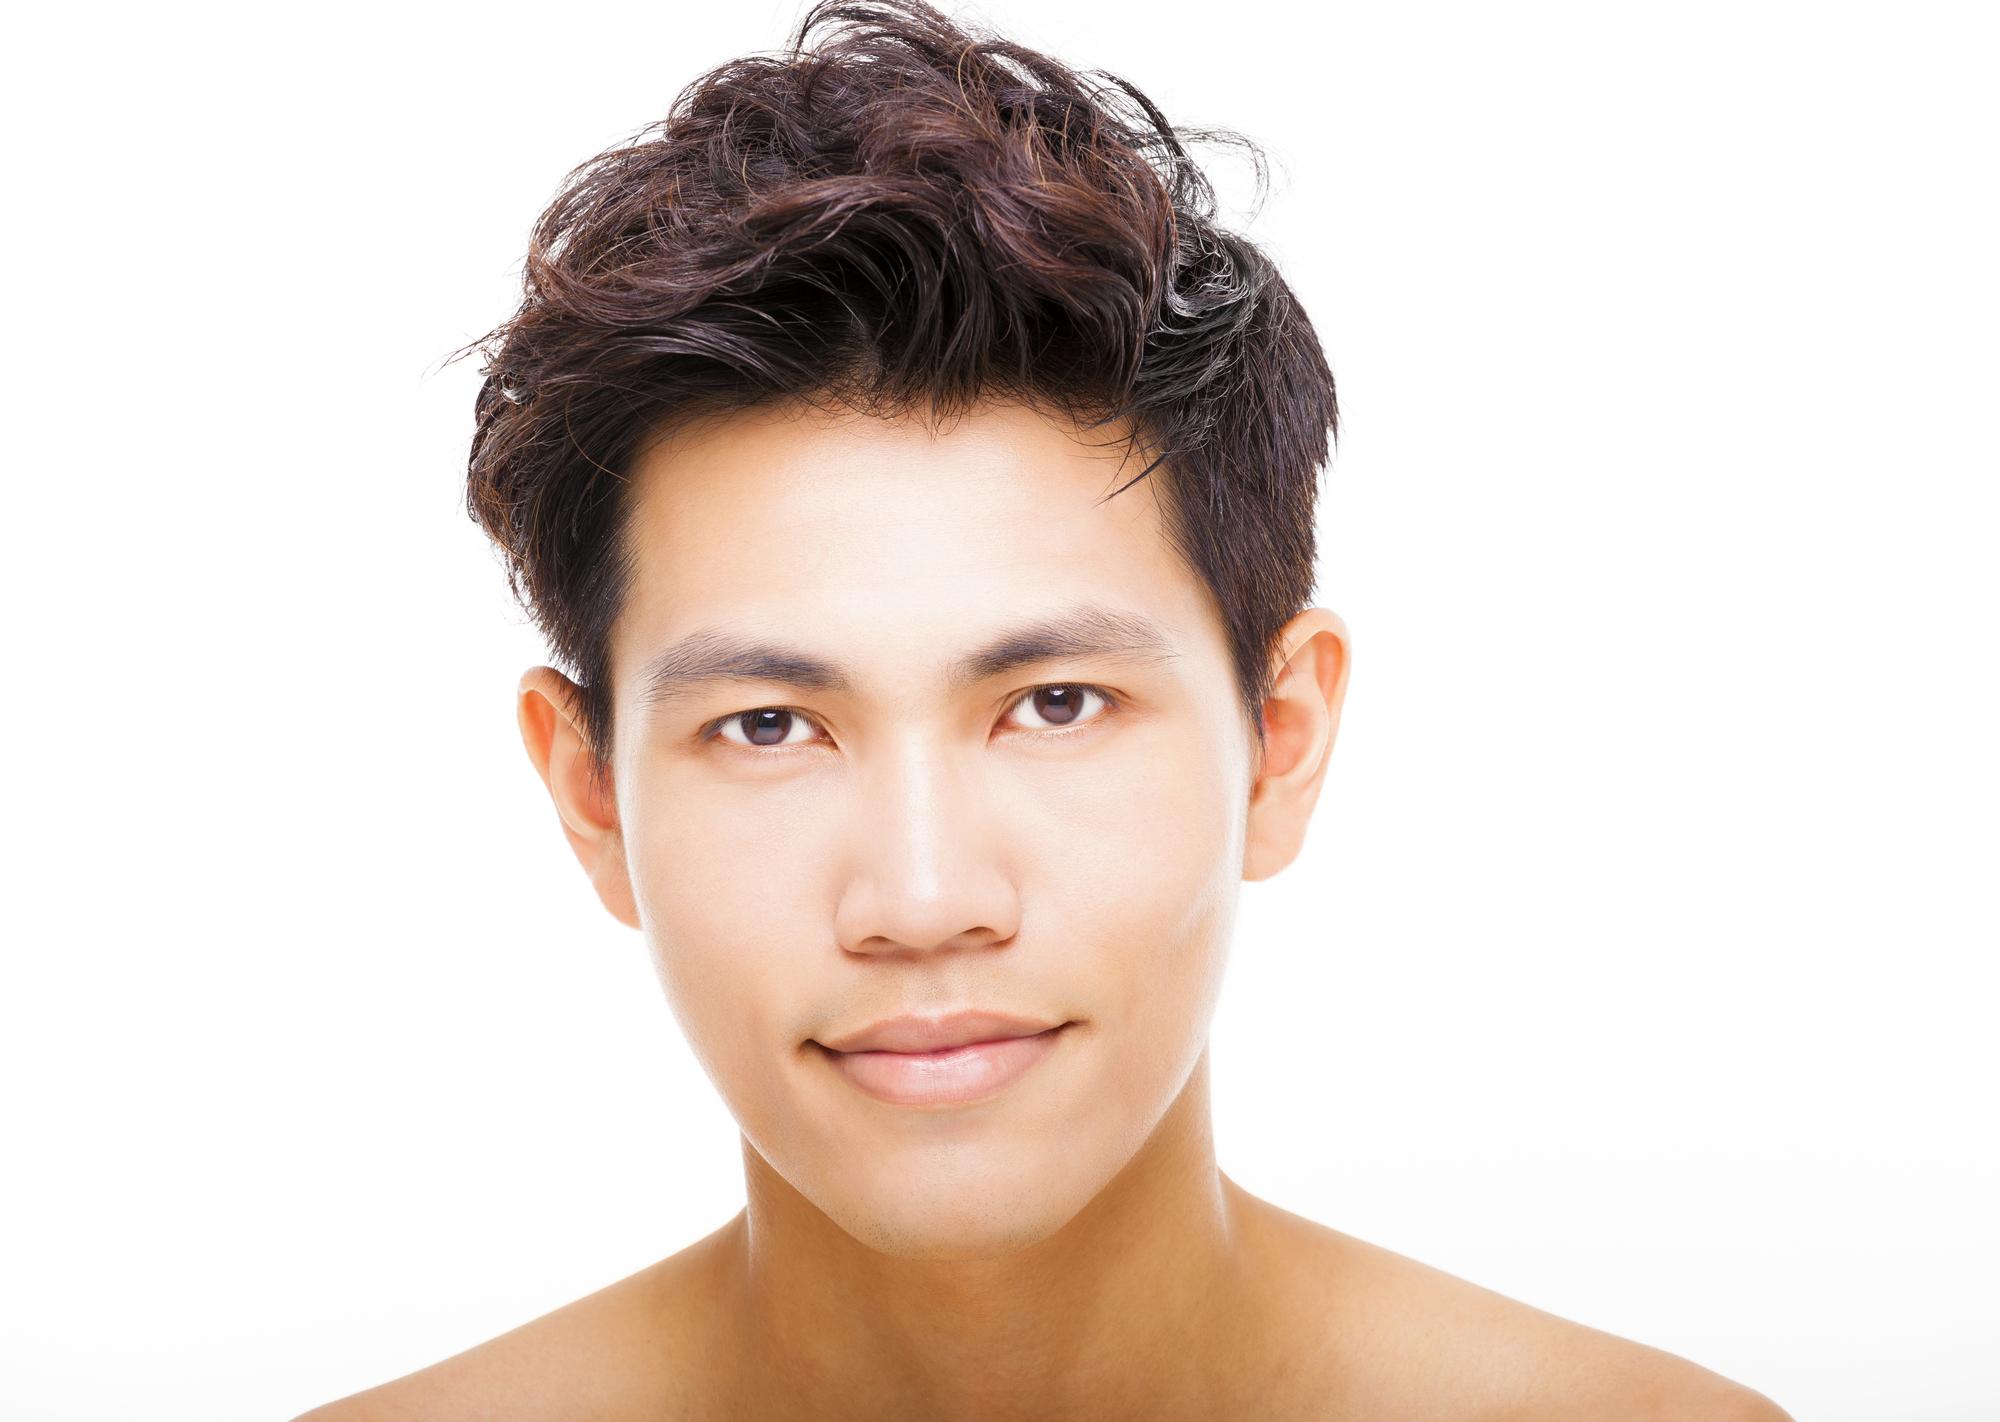 closeup young handsome man face